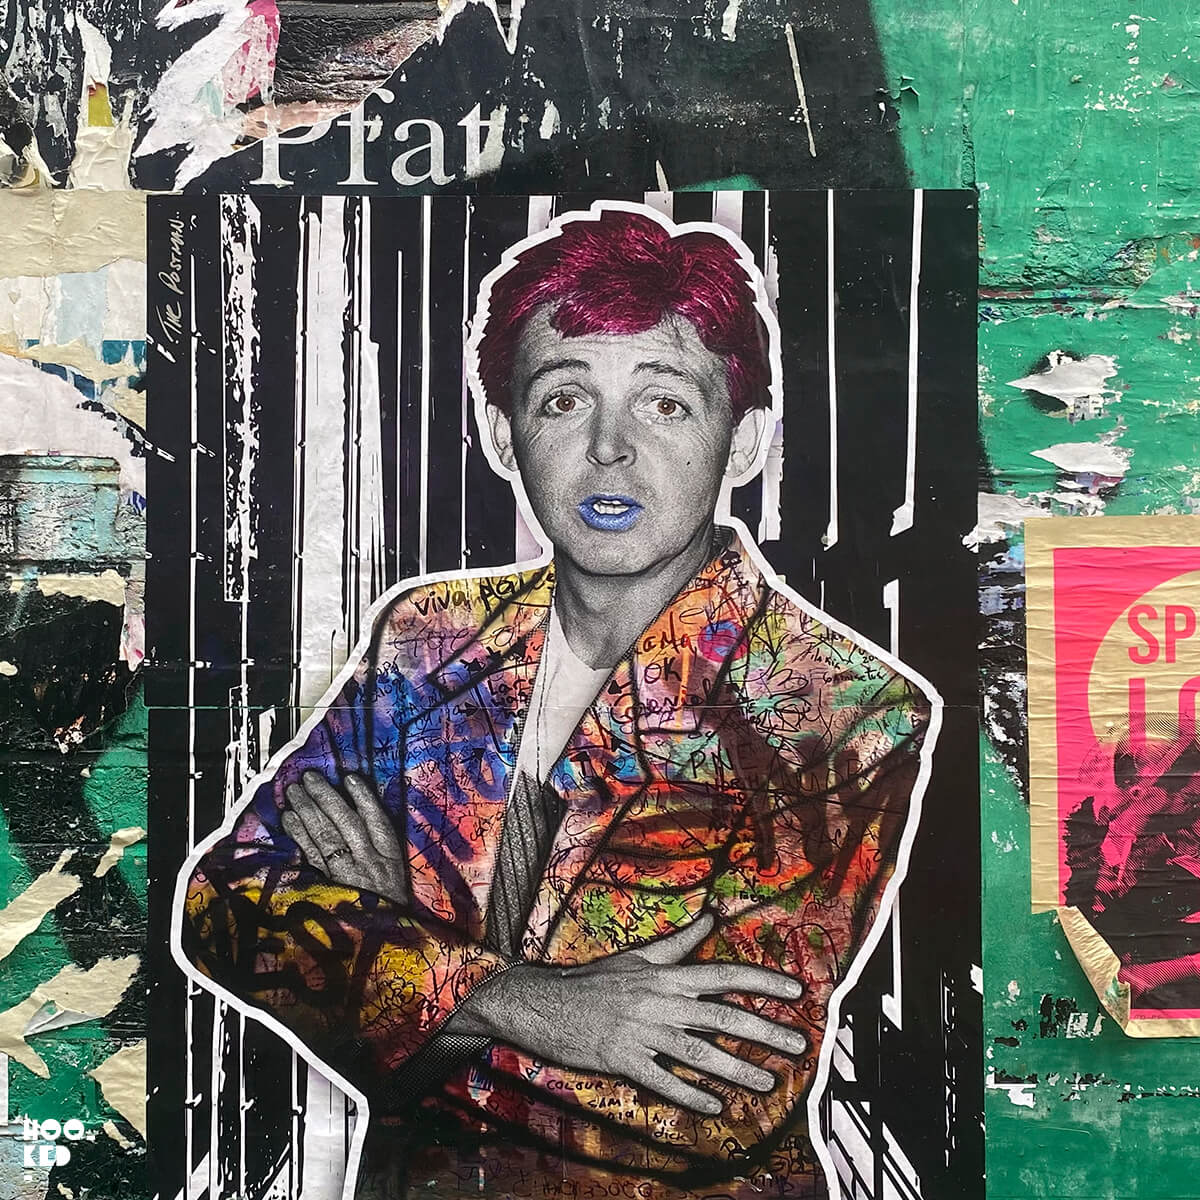 5 London Street Art Hotspots for Paste-ups - Postman Art